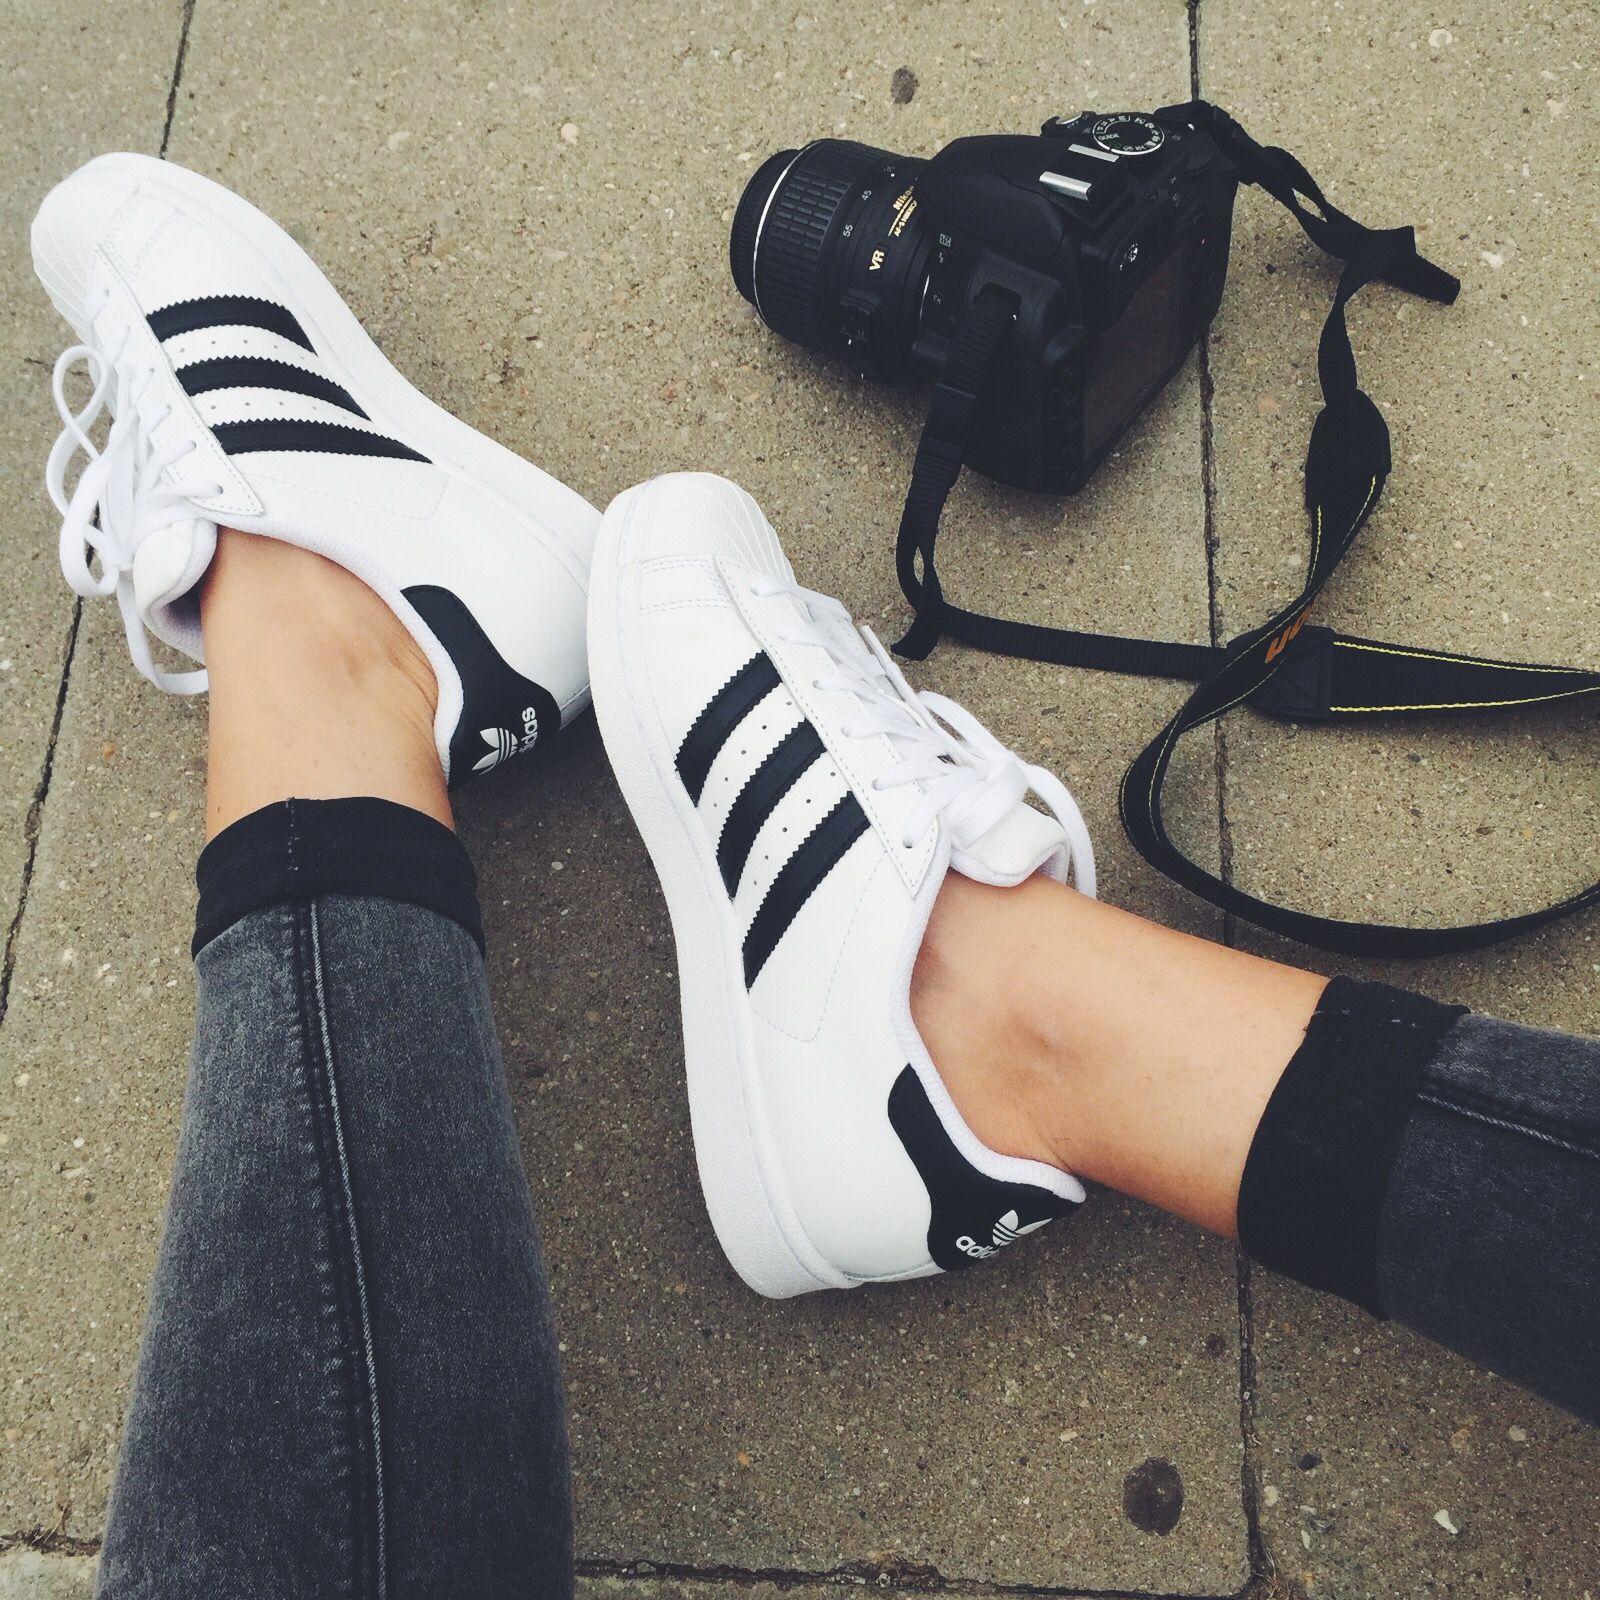 new styles 03d42 ab9ba Zapatillas Sneakers, Moda Con Zapatillas, Estilo De Zapatos, Zapatillas  Adidas, Zapatos Dama